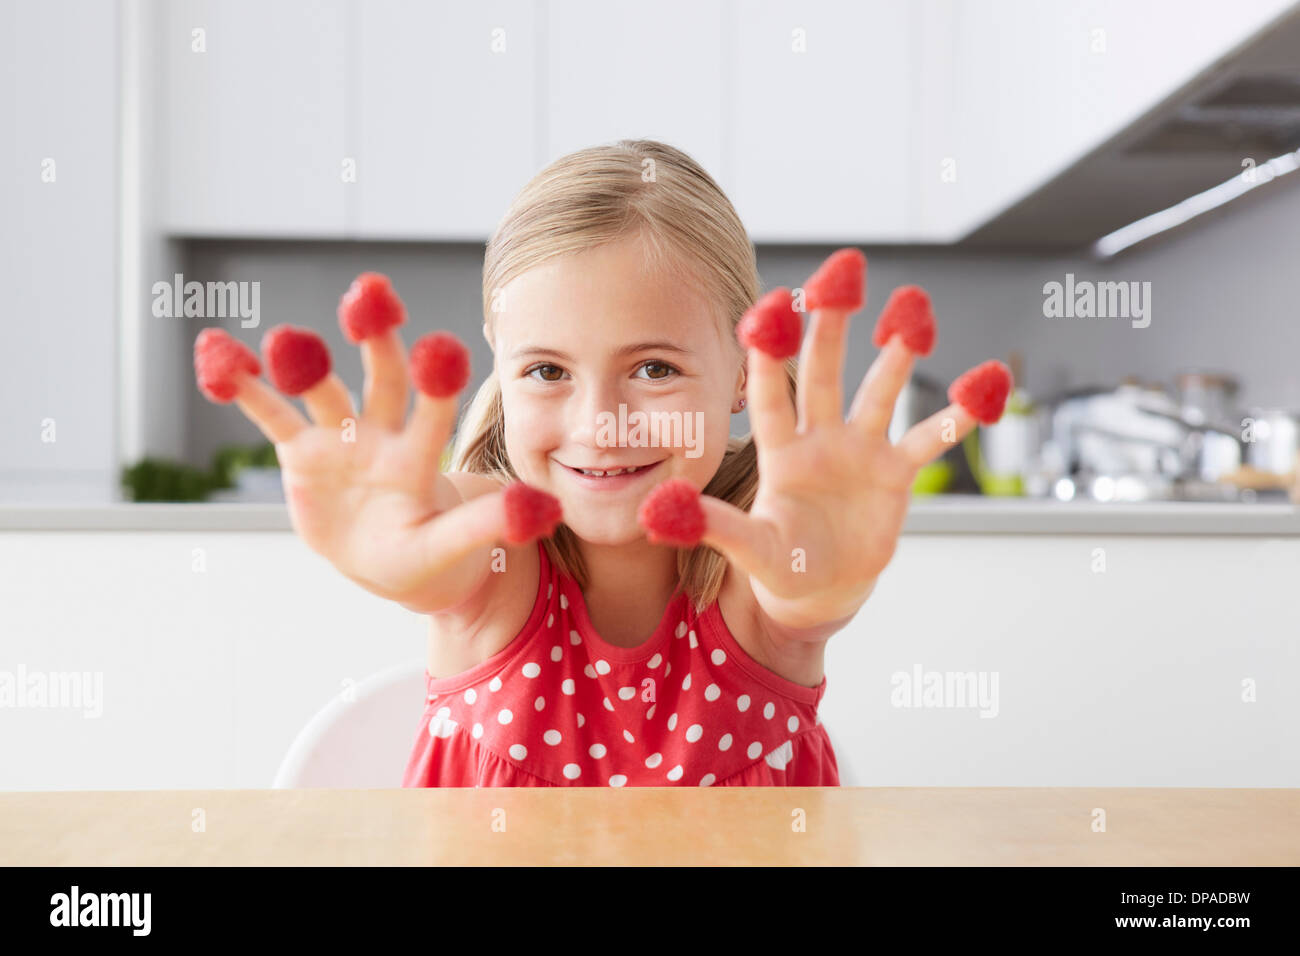 Mädchen Fingern Himbeeren aufsetzen Stockbild